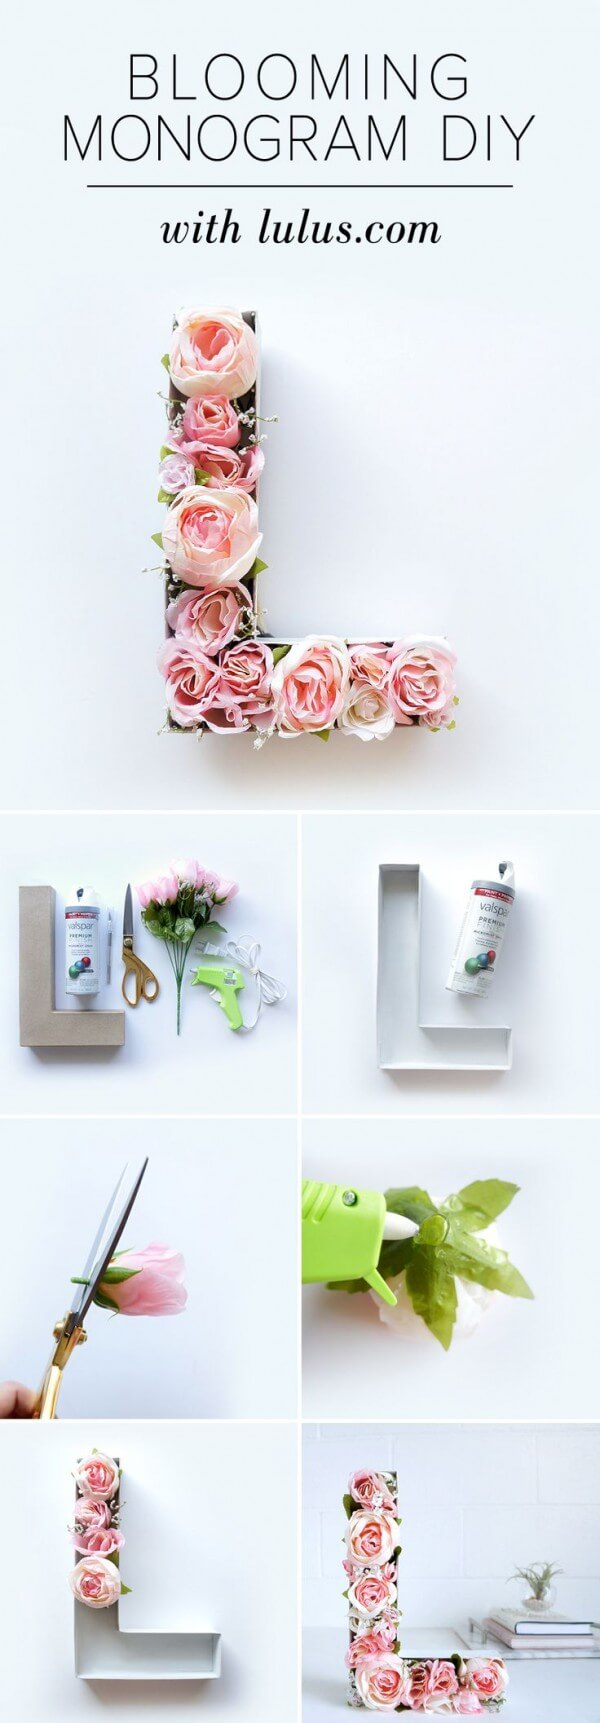 Simply Stunning DIY Floral Monogram